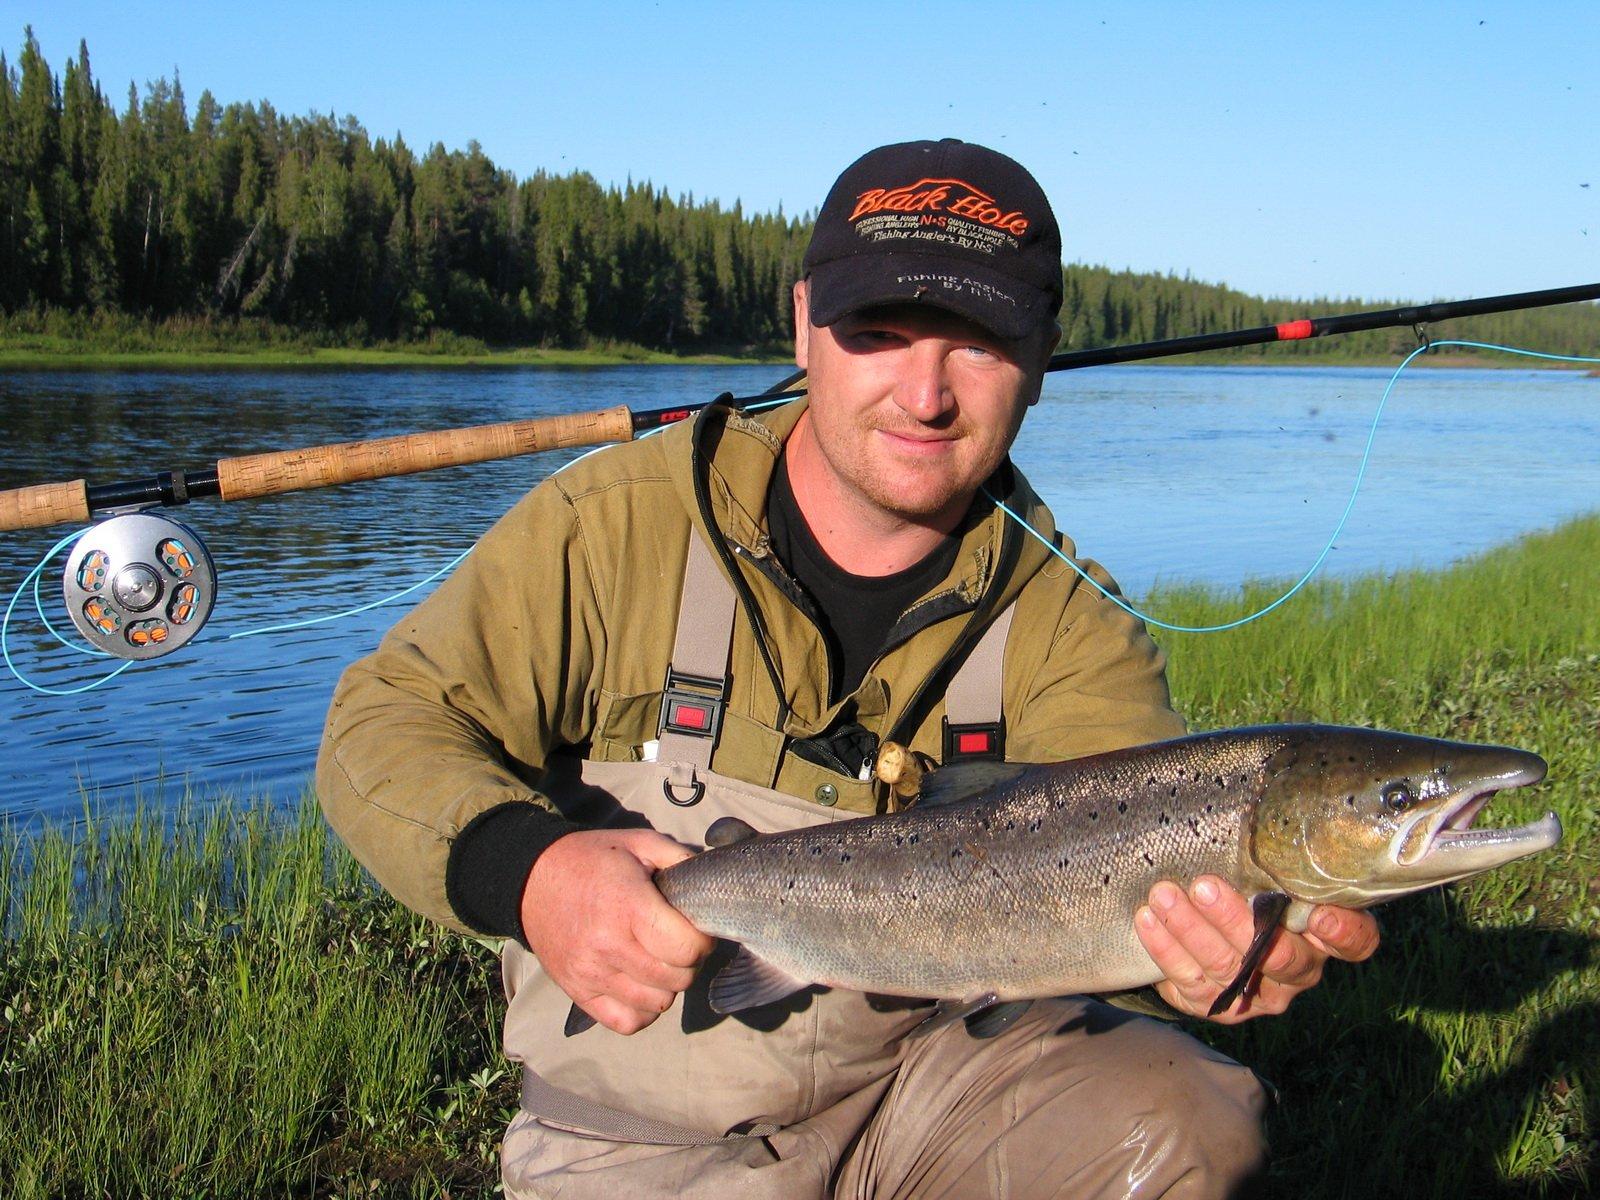 река белая мурманская область рыбалка